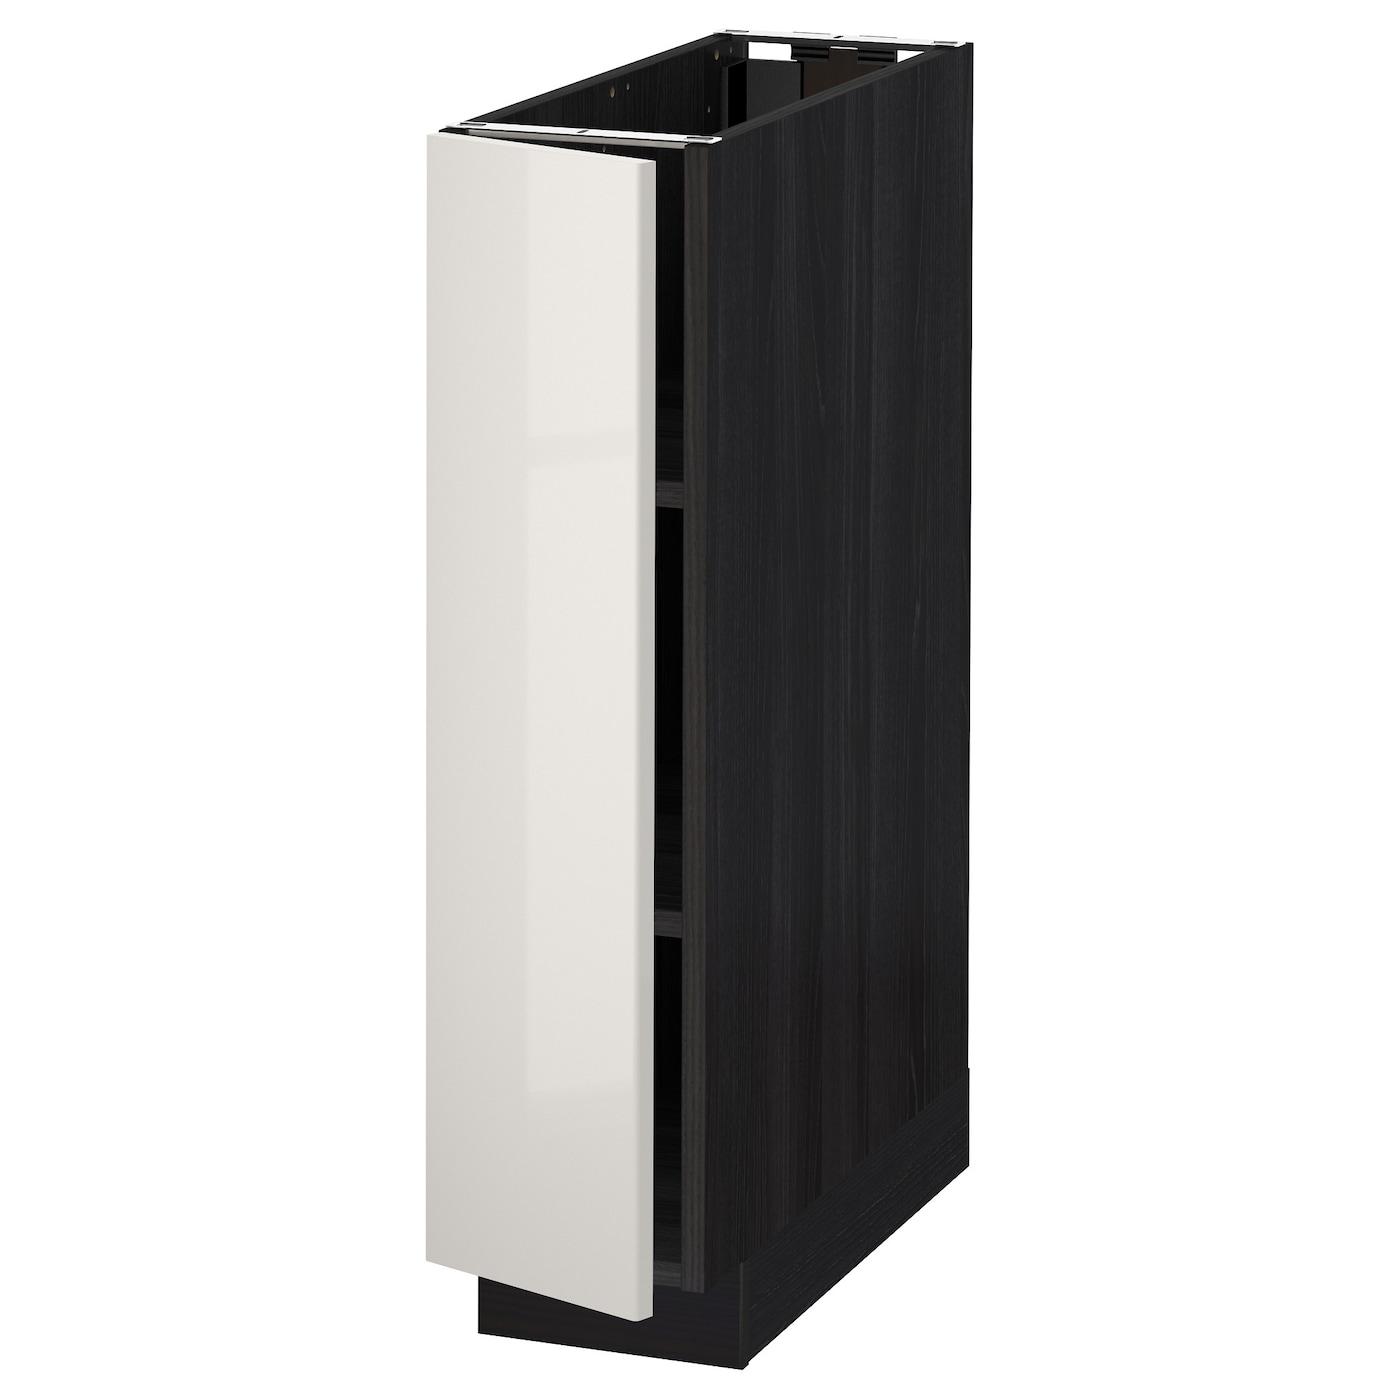 METOD Base Cabinet With Shelves Black/ringhult Light Grey 20 X 60 Cm